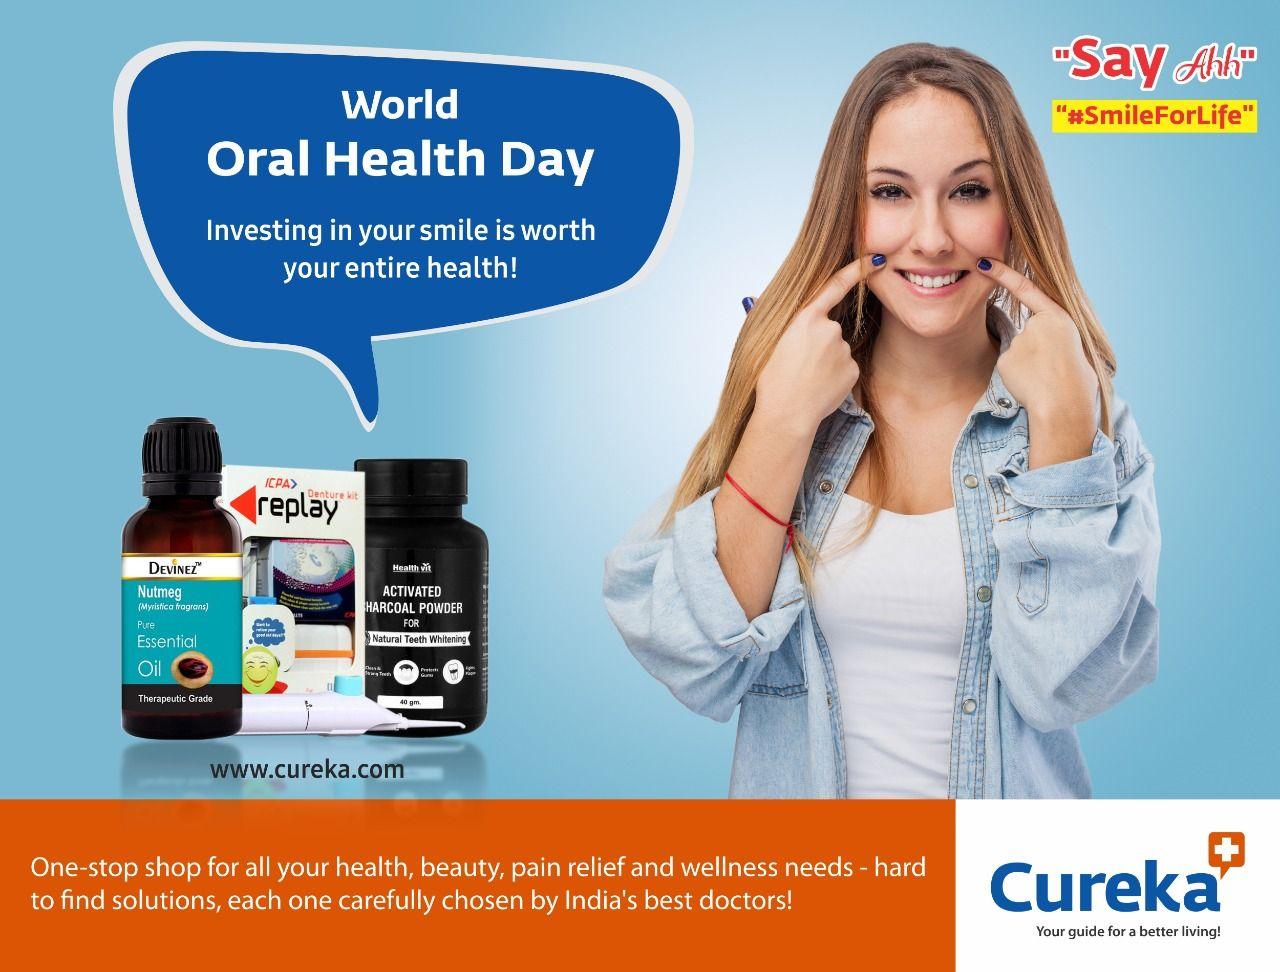 worldoralhealthday2020 in 2020 Health day, Oral health